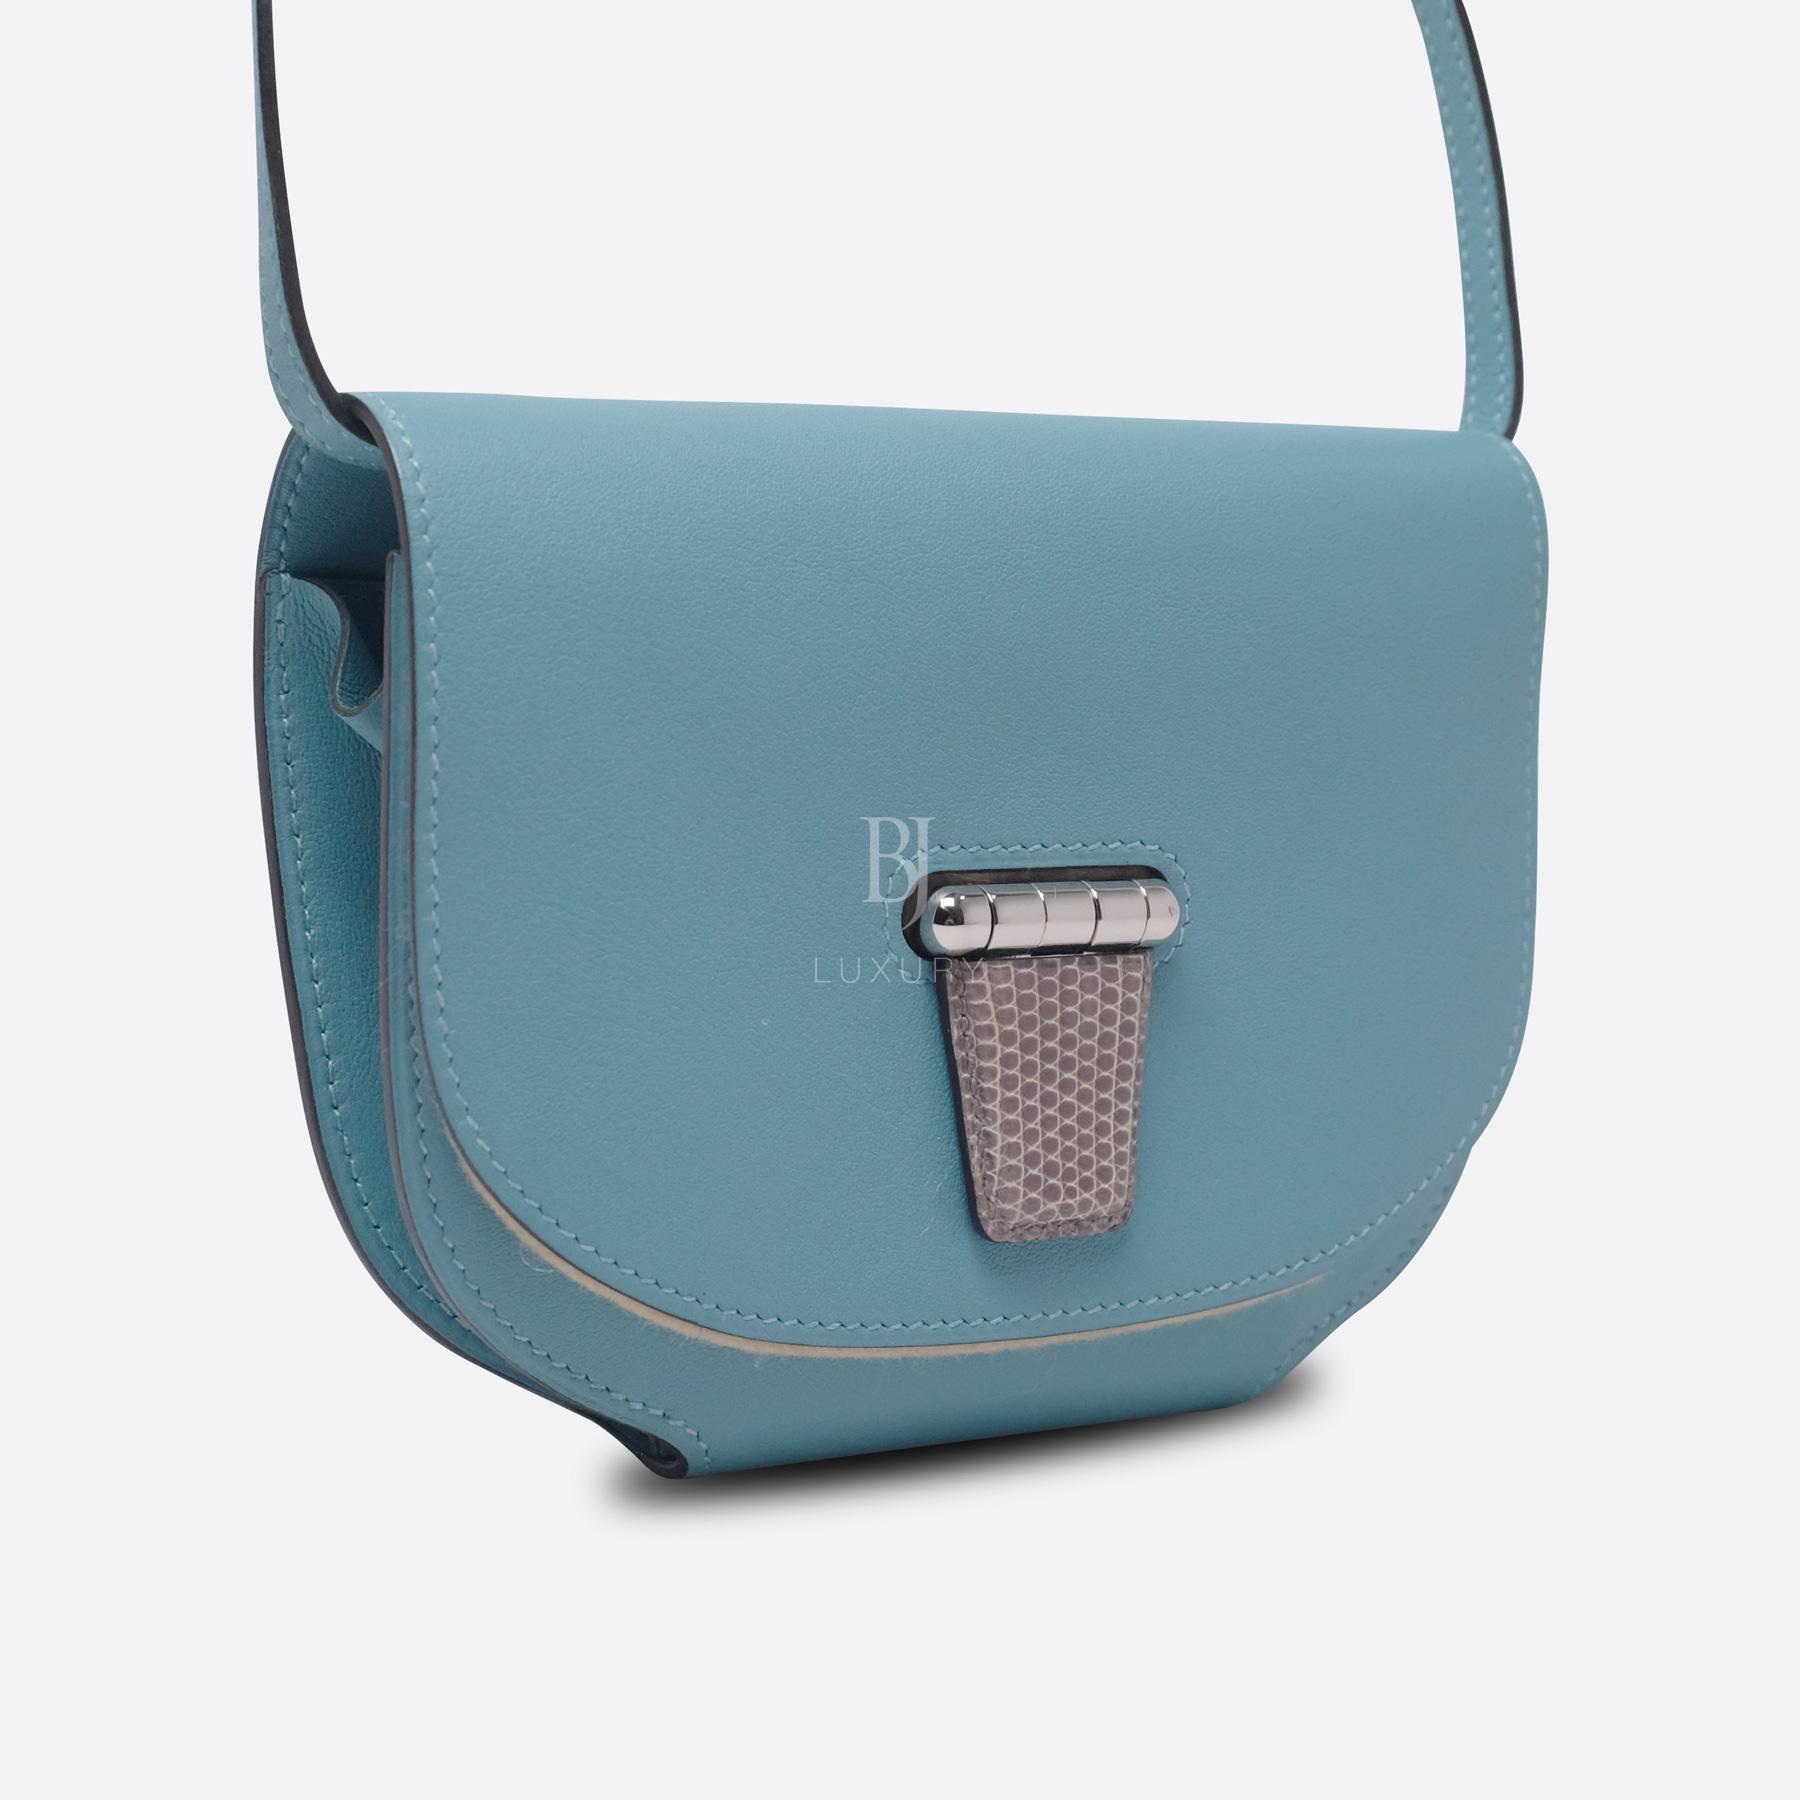 Hermes Conveyor Bag 16 Turquoise Swift Lizard Palladium BJ Luxury 2.jpg